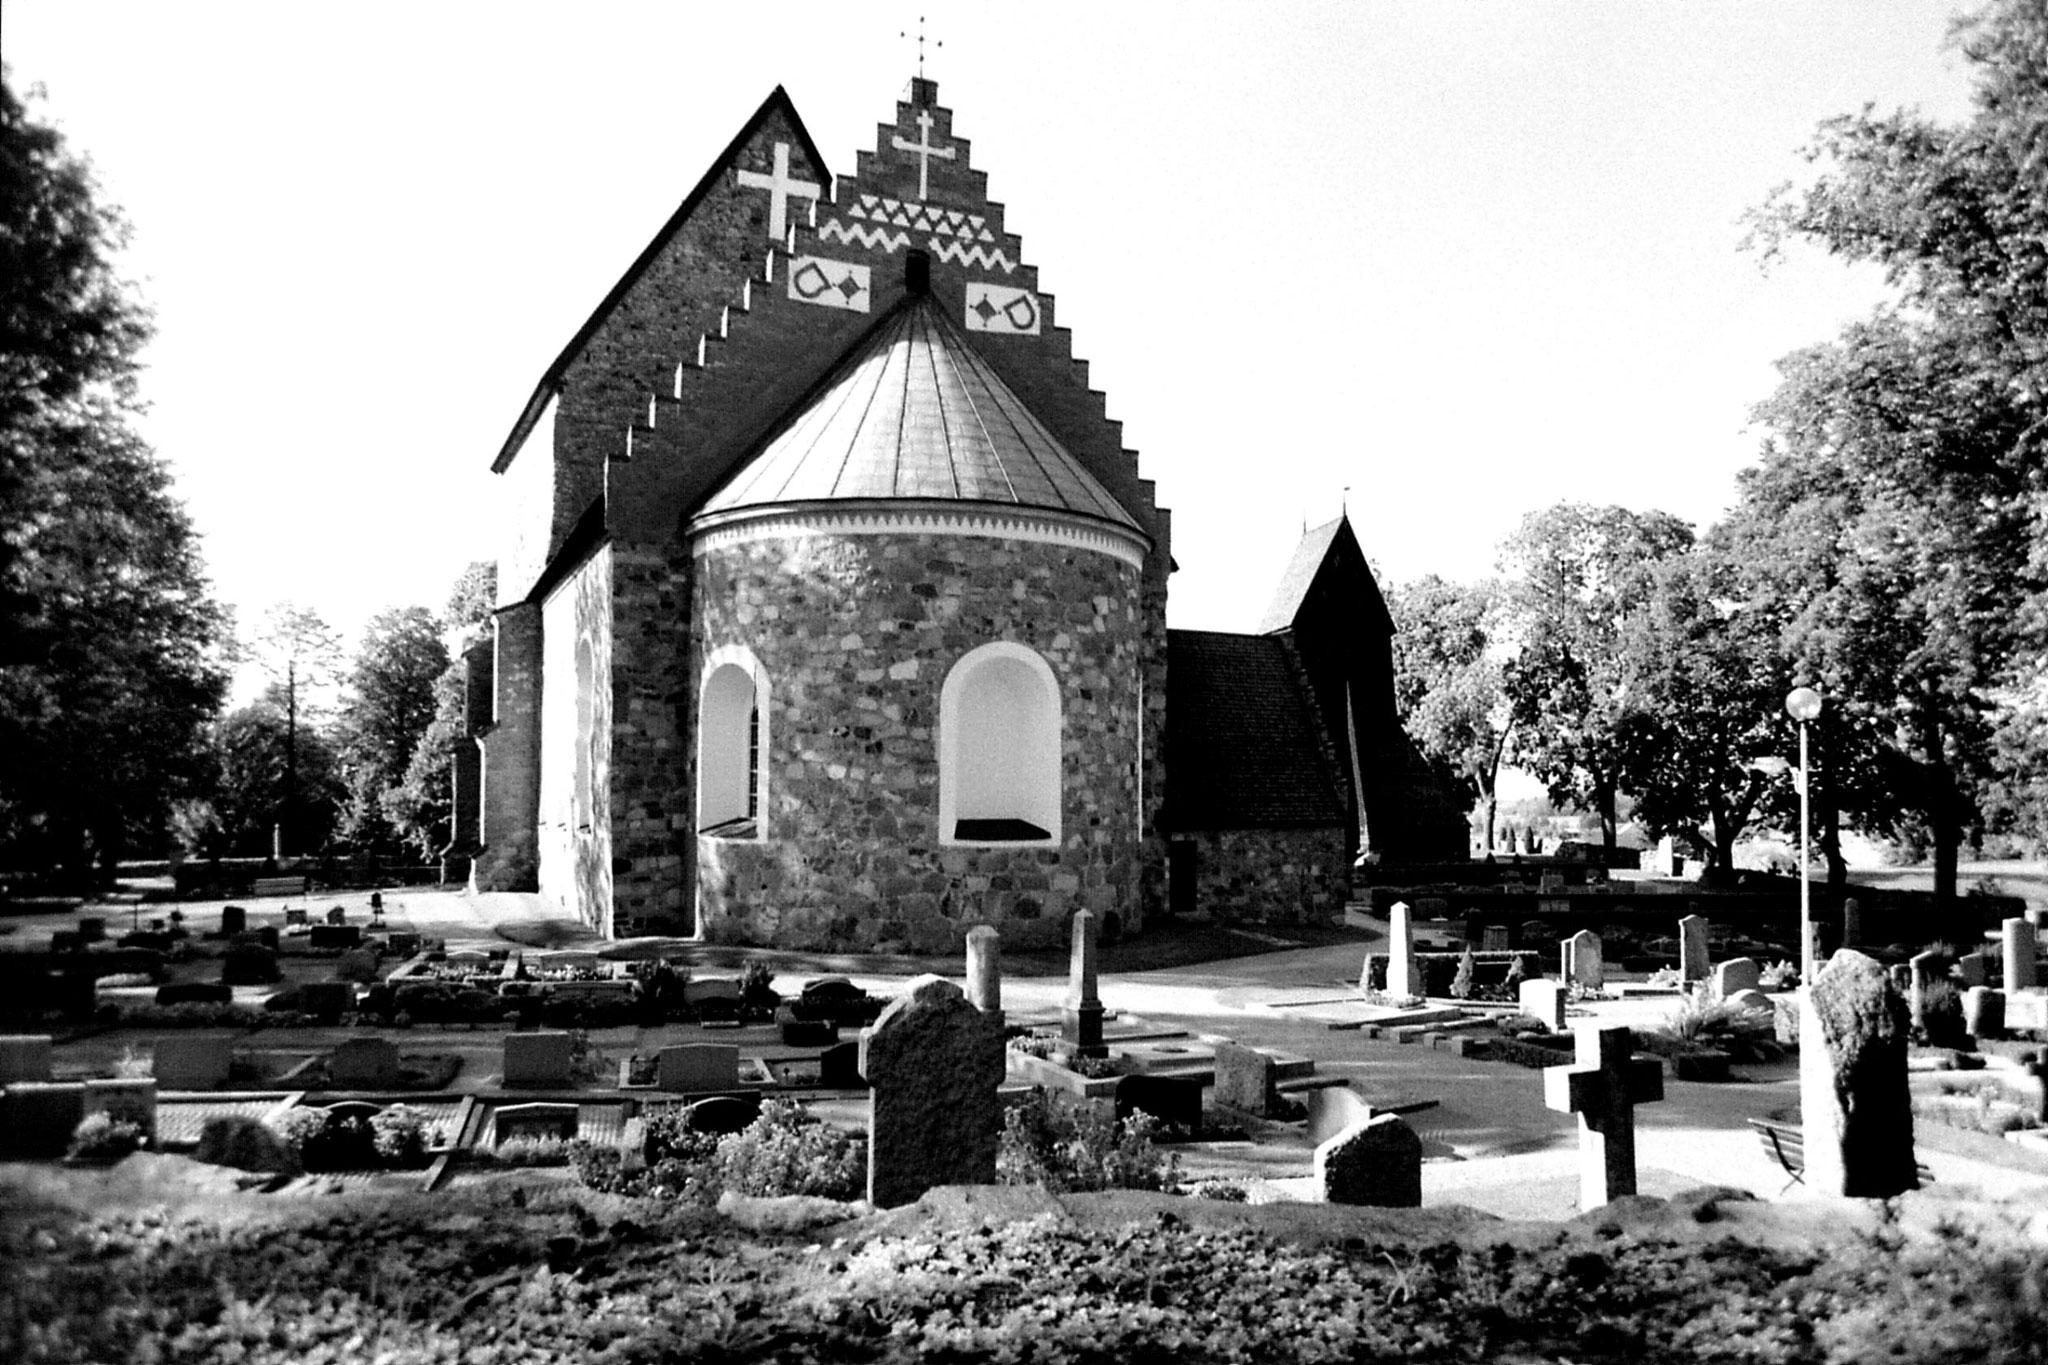 9/9/1988: 3: Gamla Uppsala church